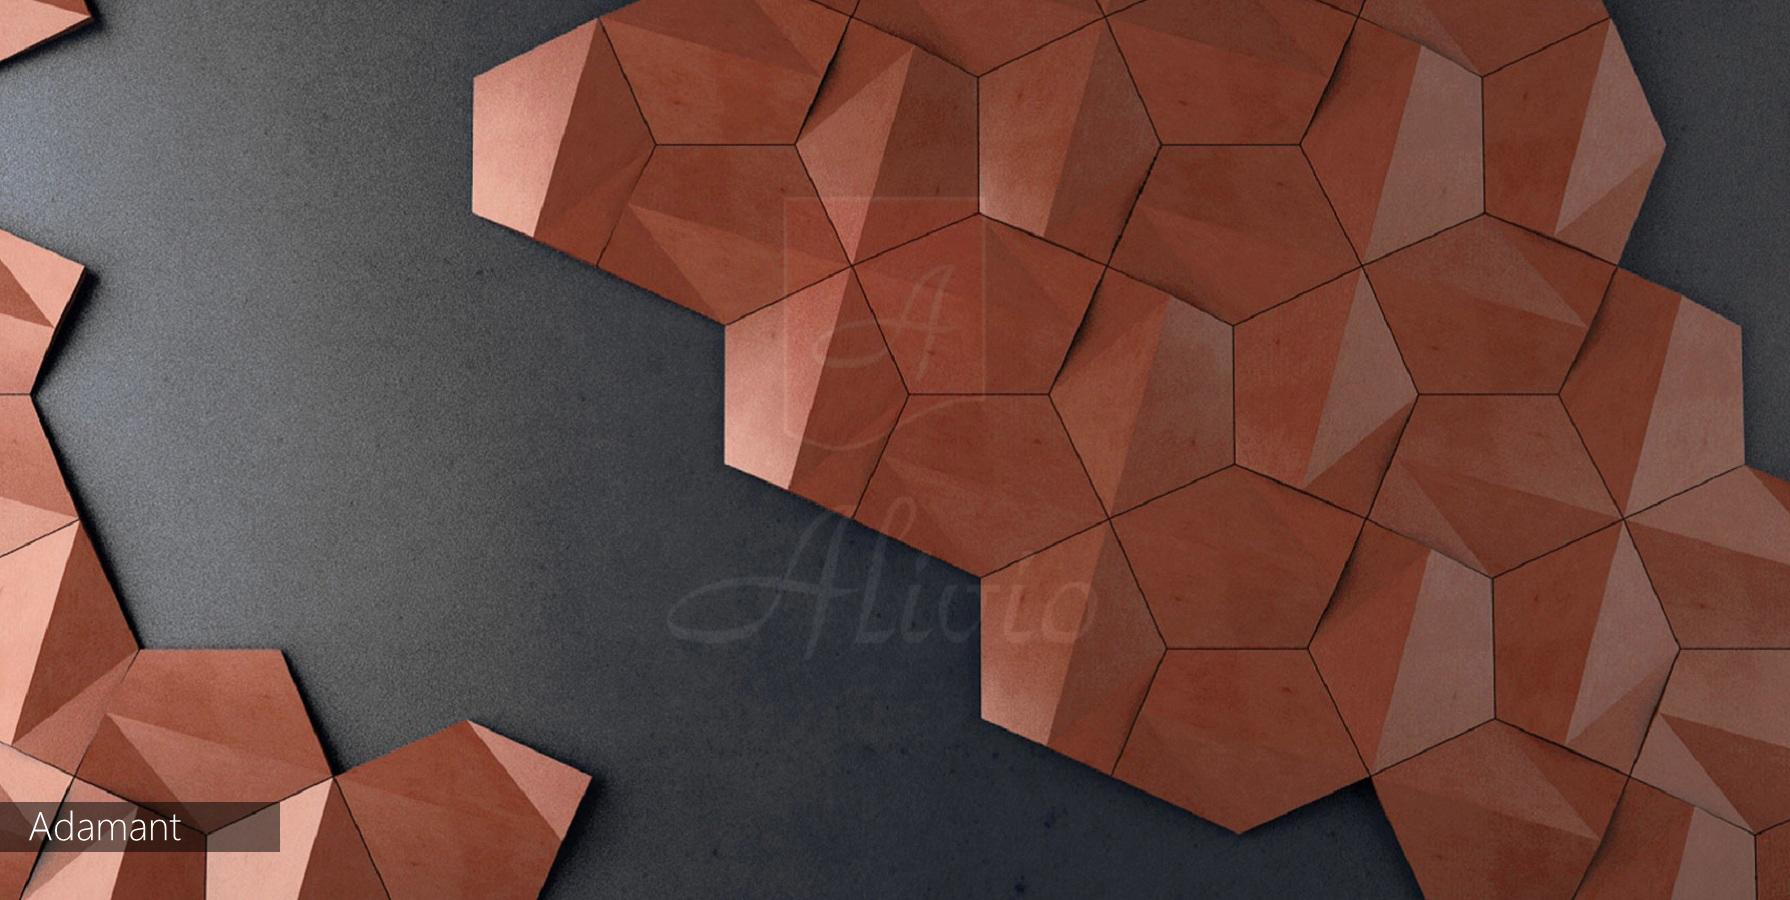 варианты отделки стен панели Alivio серии Adamant фото